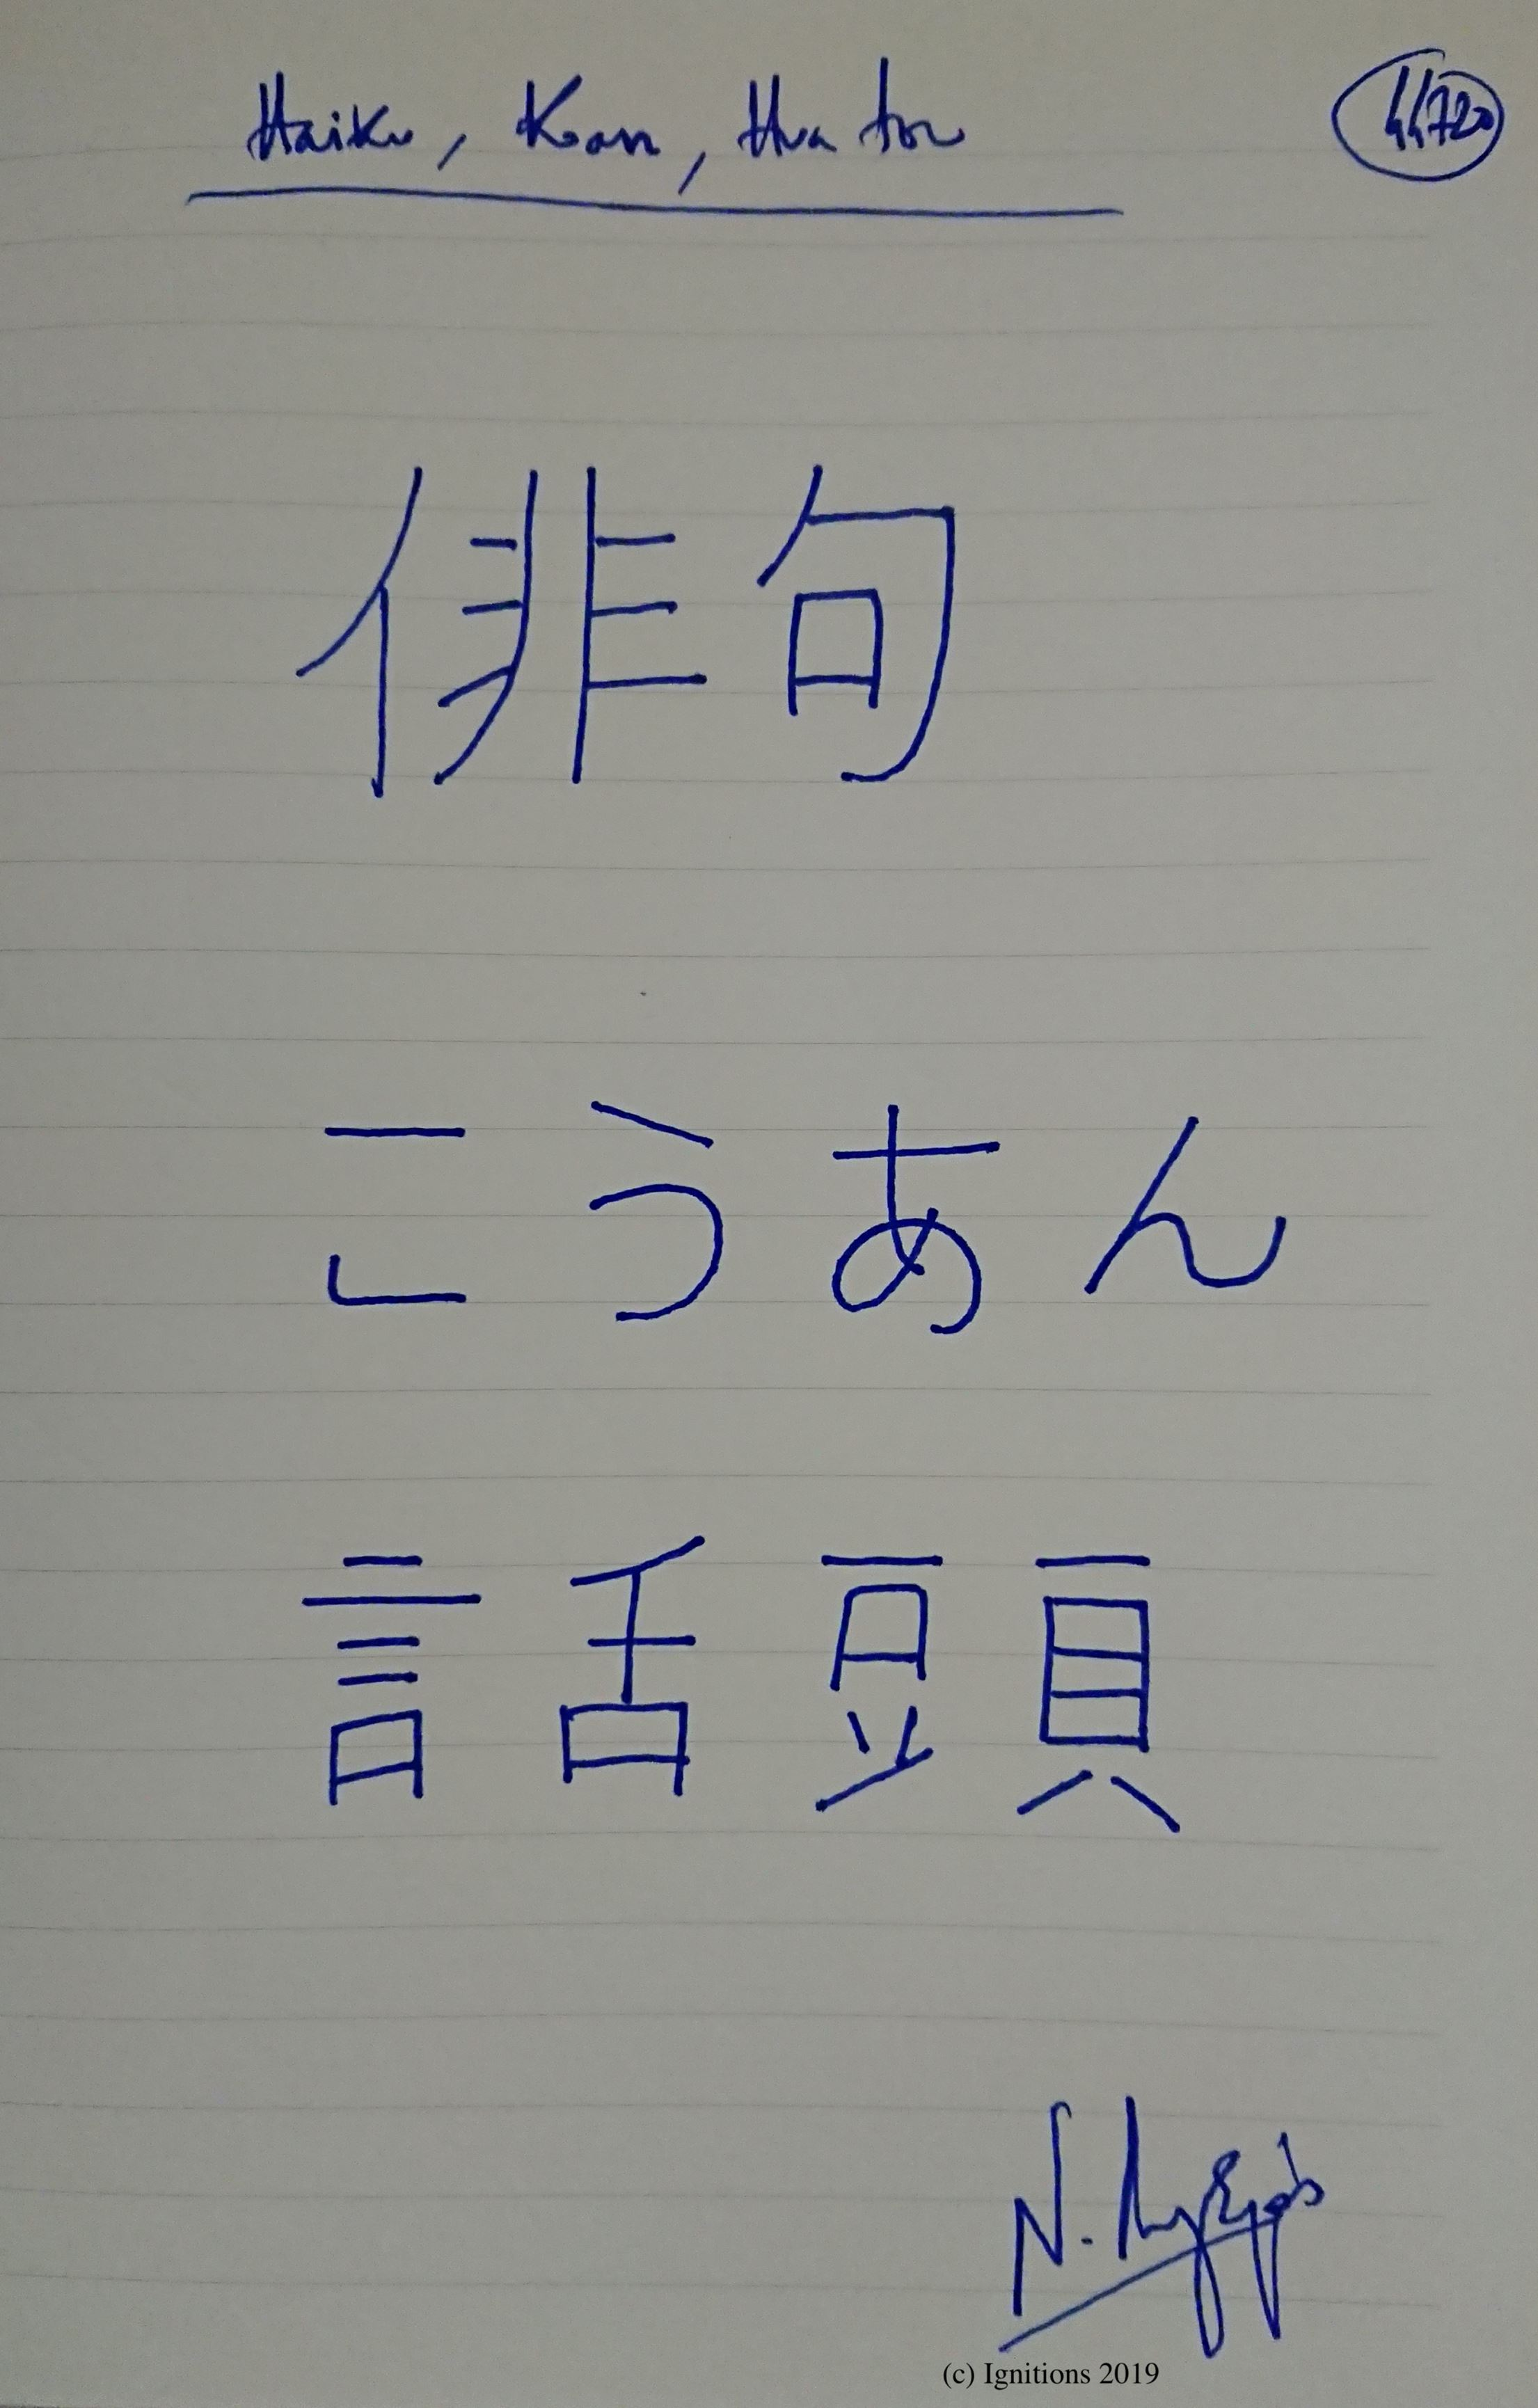 Haiku, Koan, Hua Tou. (Dessin)